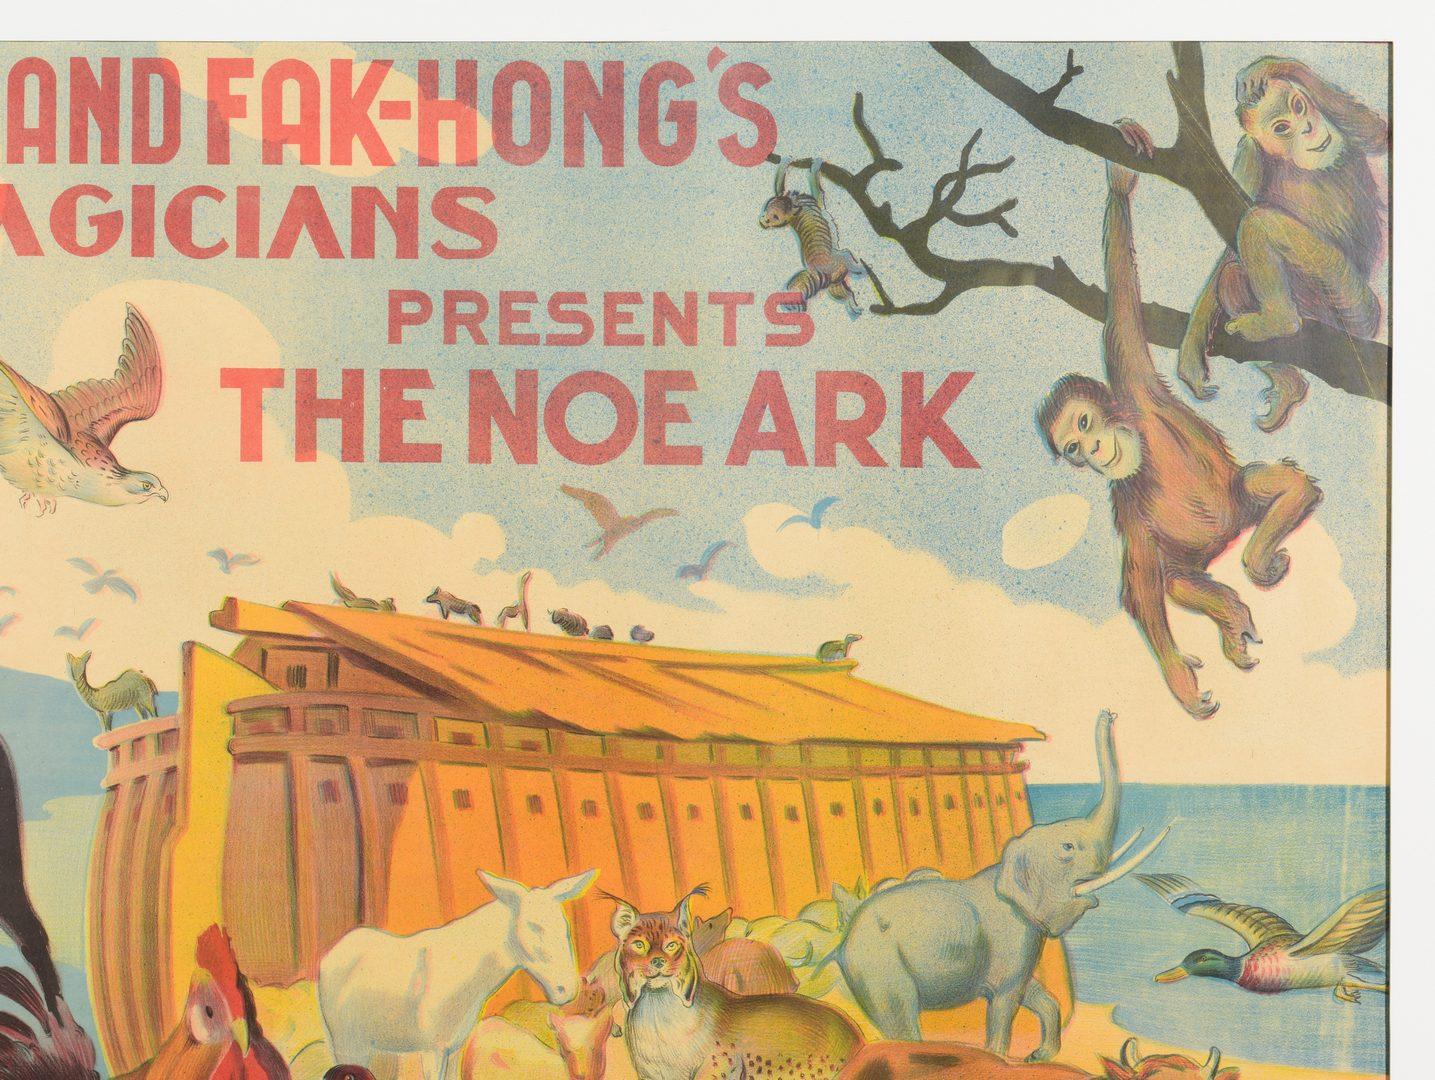 Lot 838: Great Chang & Fak Hong Noah's Ark Advertising Poster